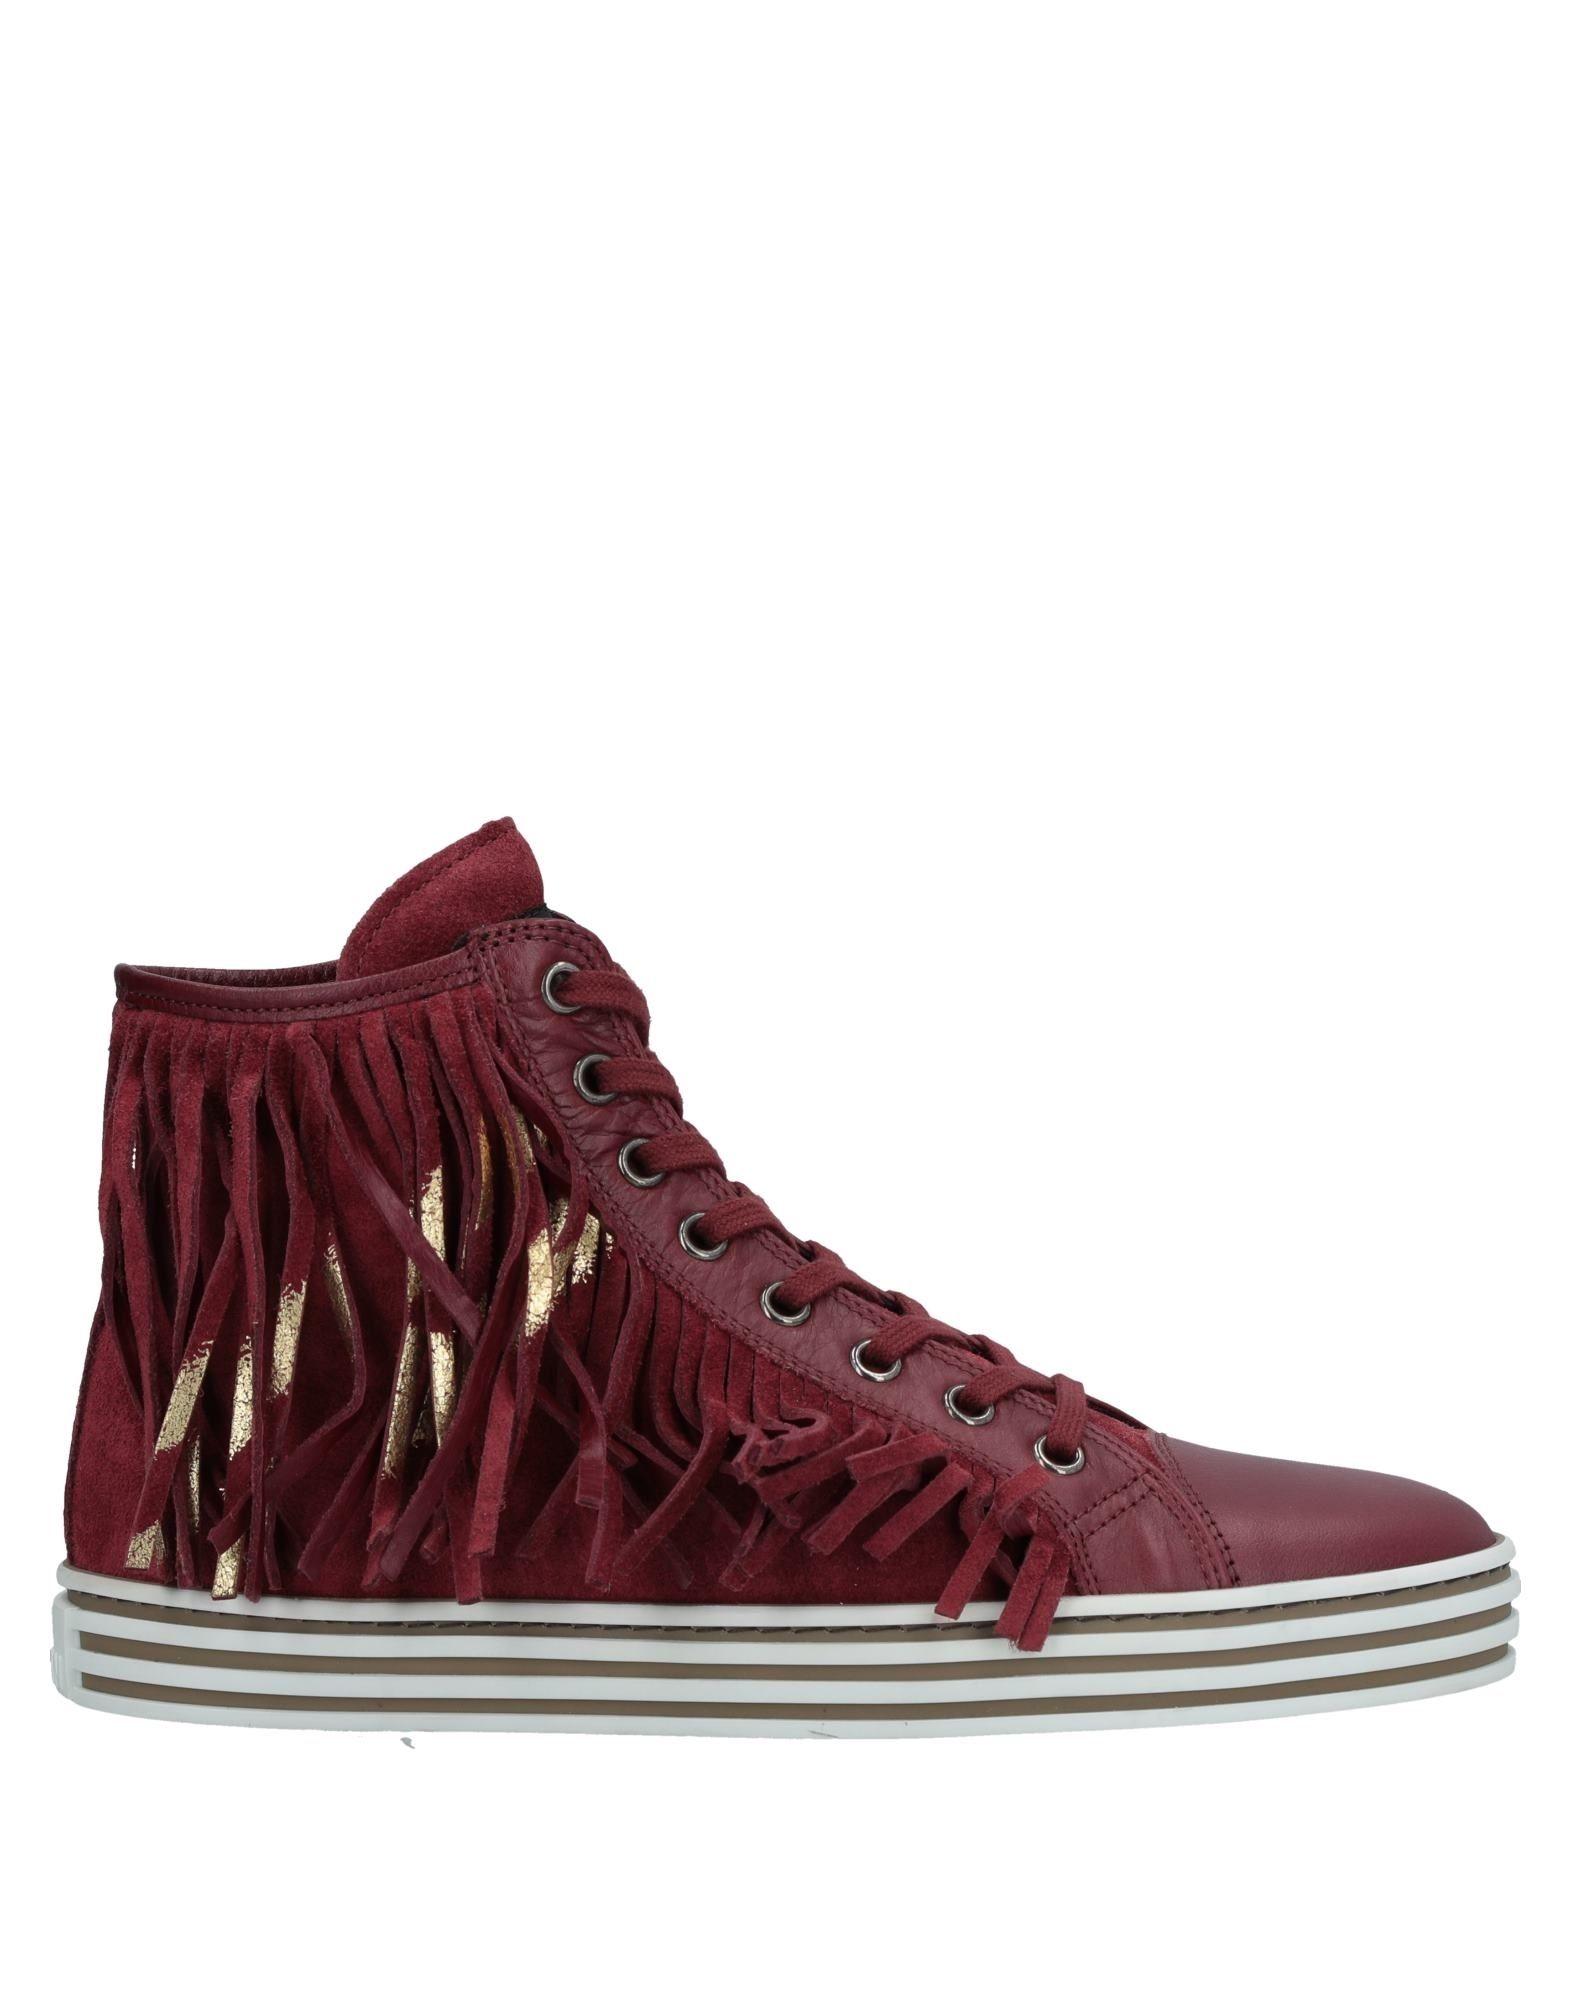 Hogan Sneakers Damen  11539287JEGut aussehende strapazierfähige Schuhe